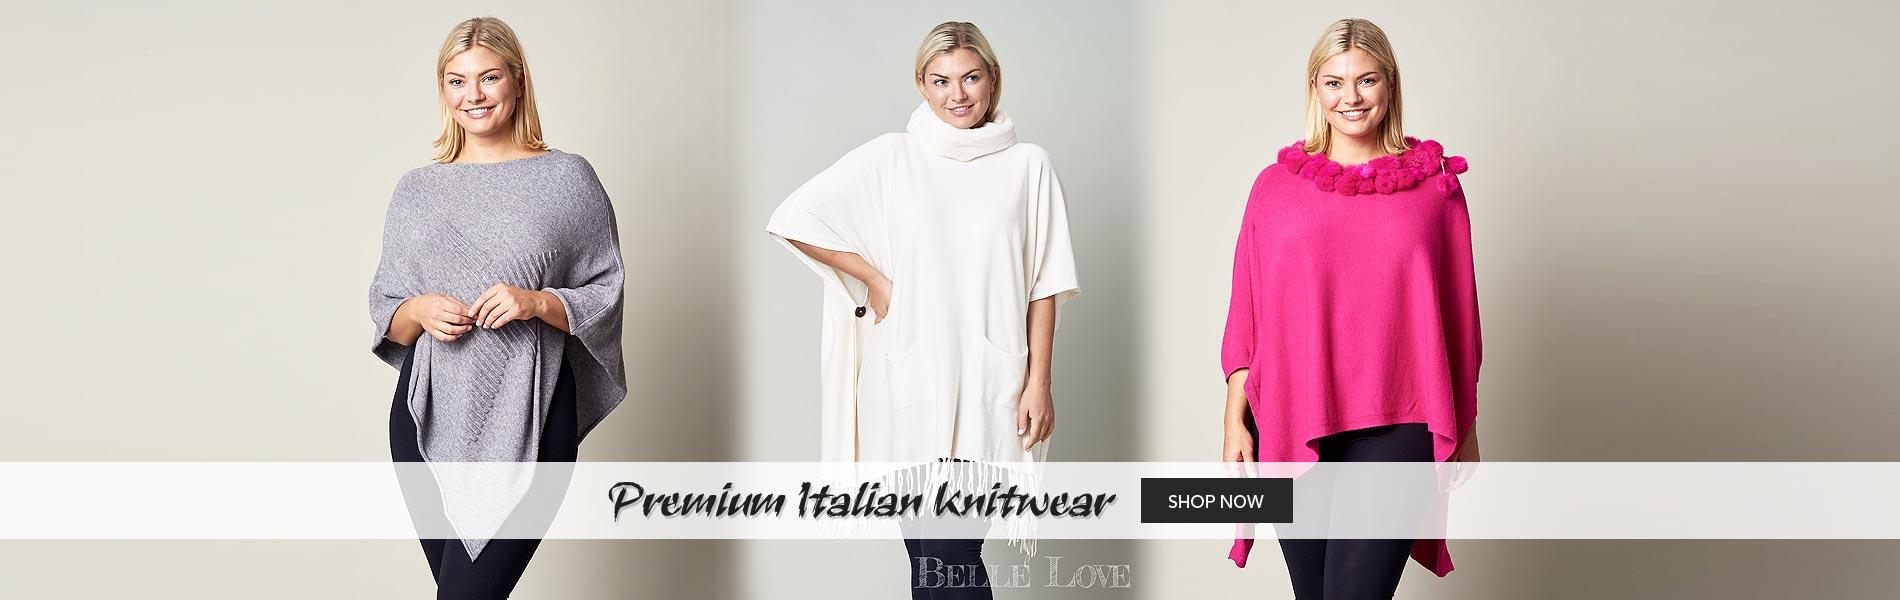 Premium Italian Knitwear